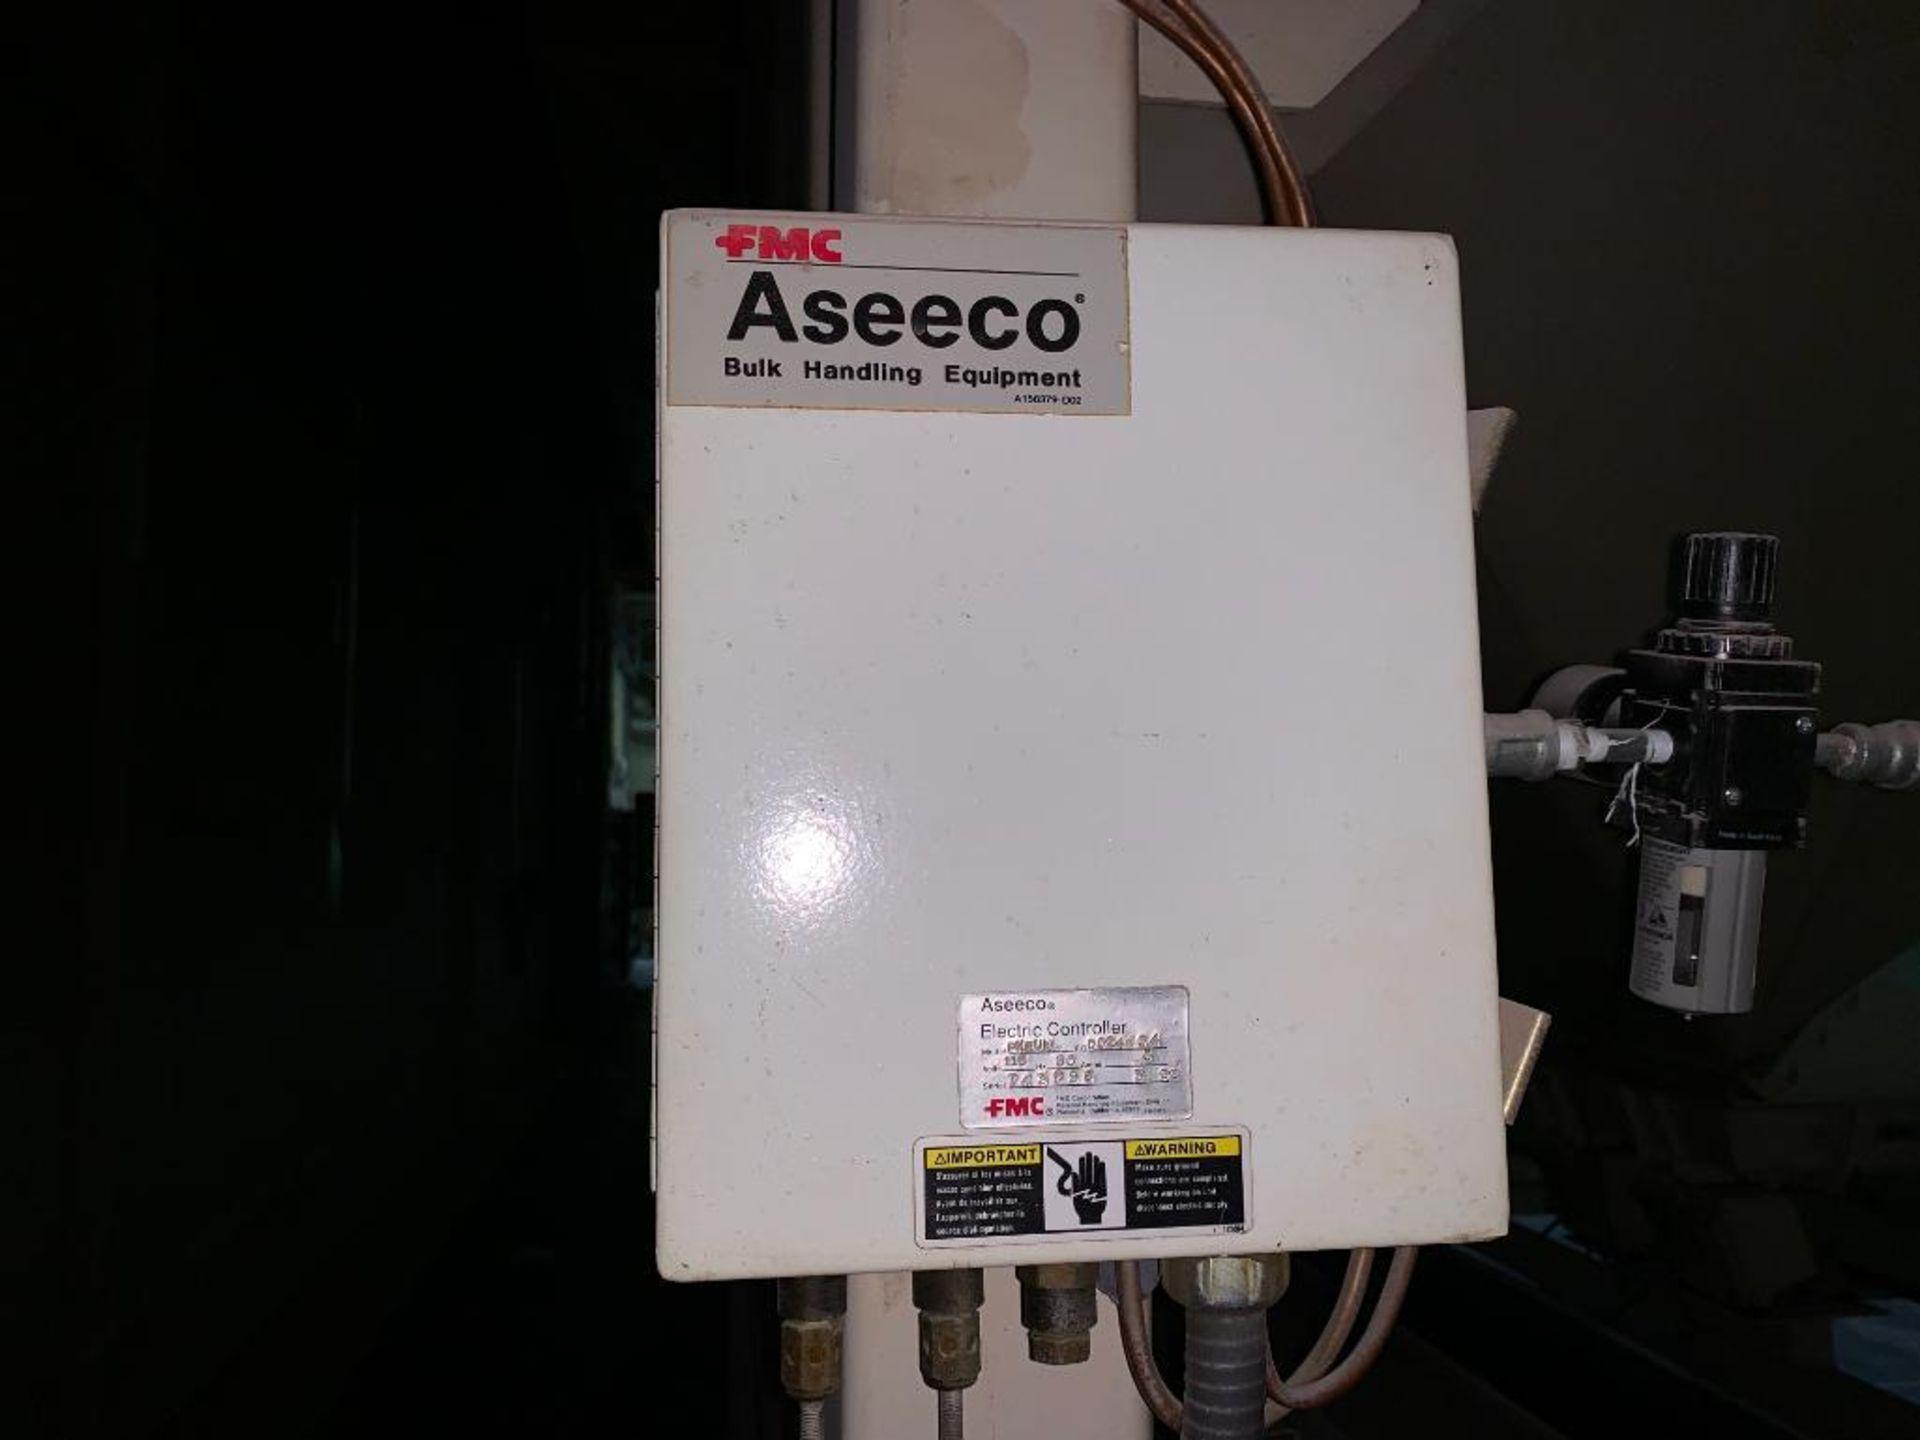 Aseeco mild steel cone bottom bulk storage bin - Image 18 of 22